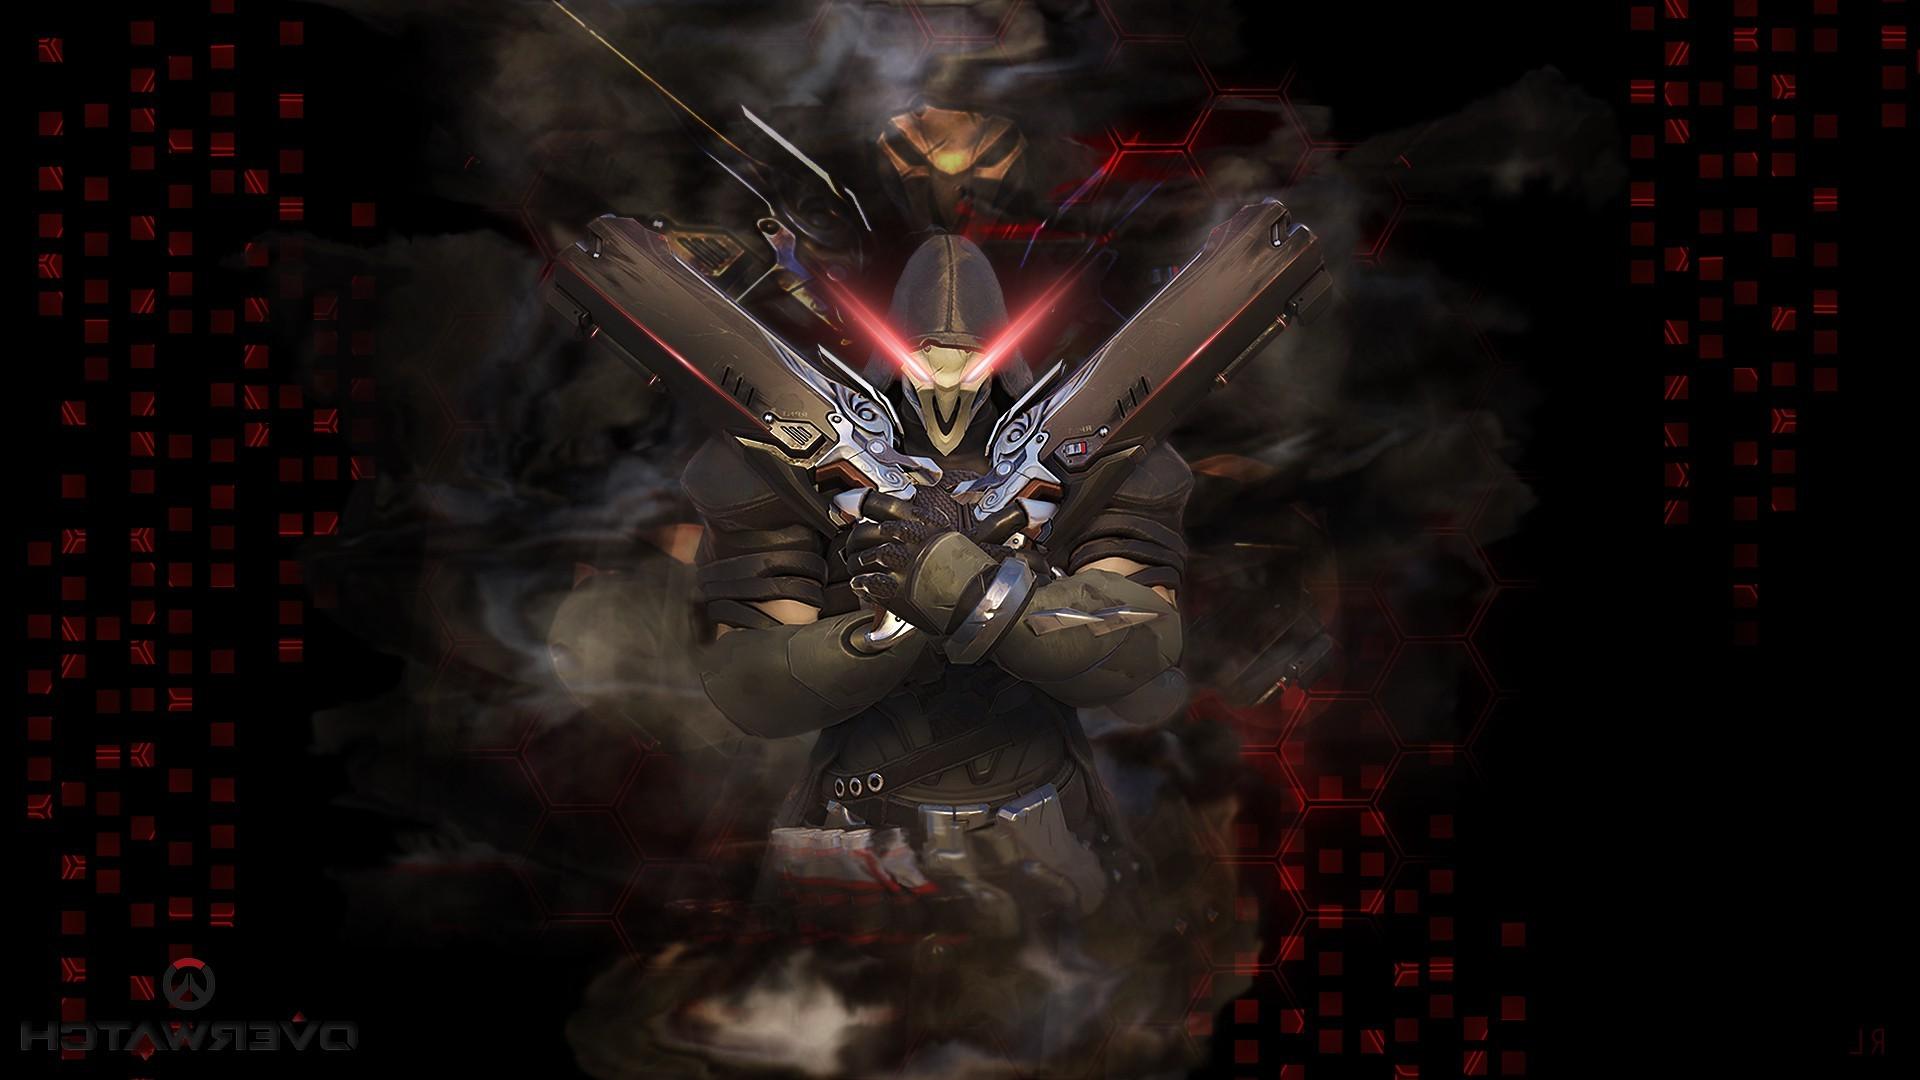 Wallpaper 1920x1080 Px Blizzard Entertainment Reaper Overwatch